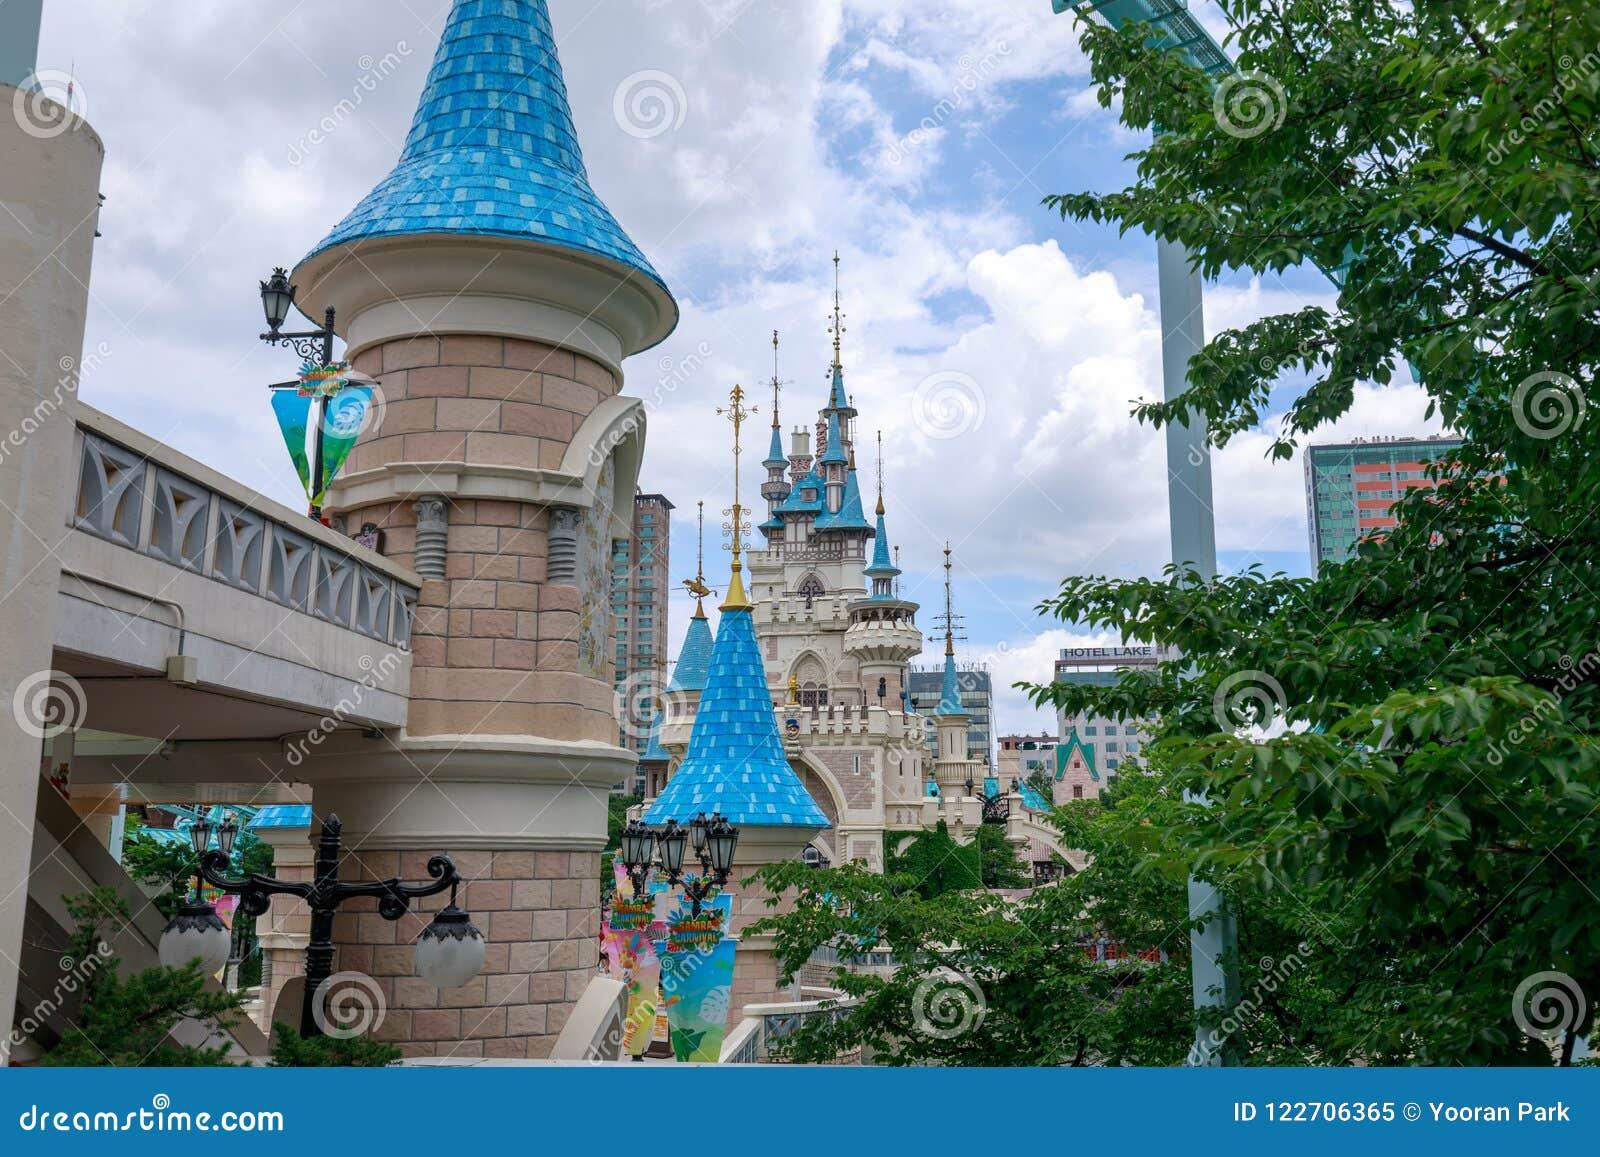 Lotte World Amusement Theme Park Around Seokchon Lake A Major